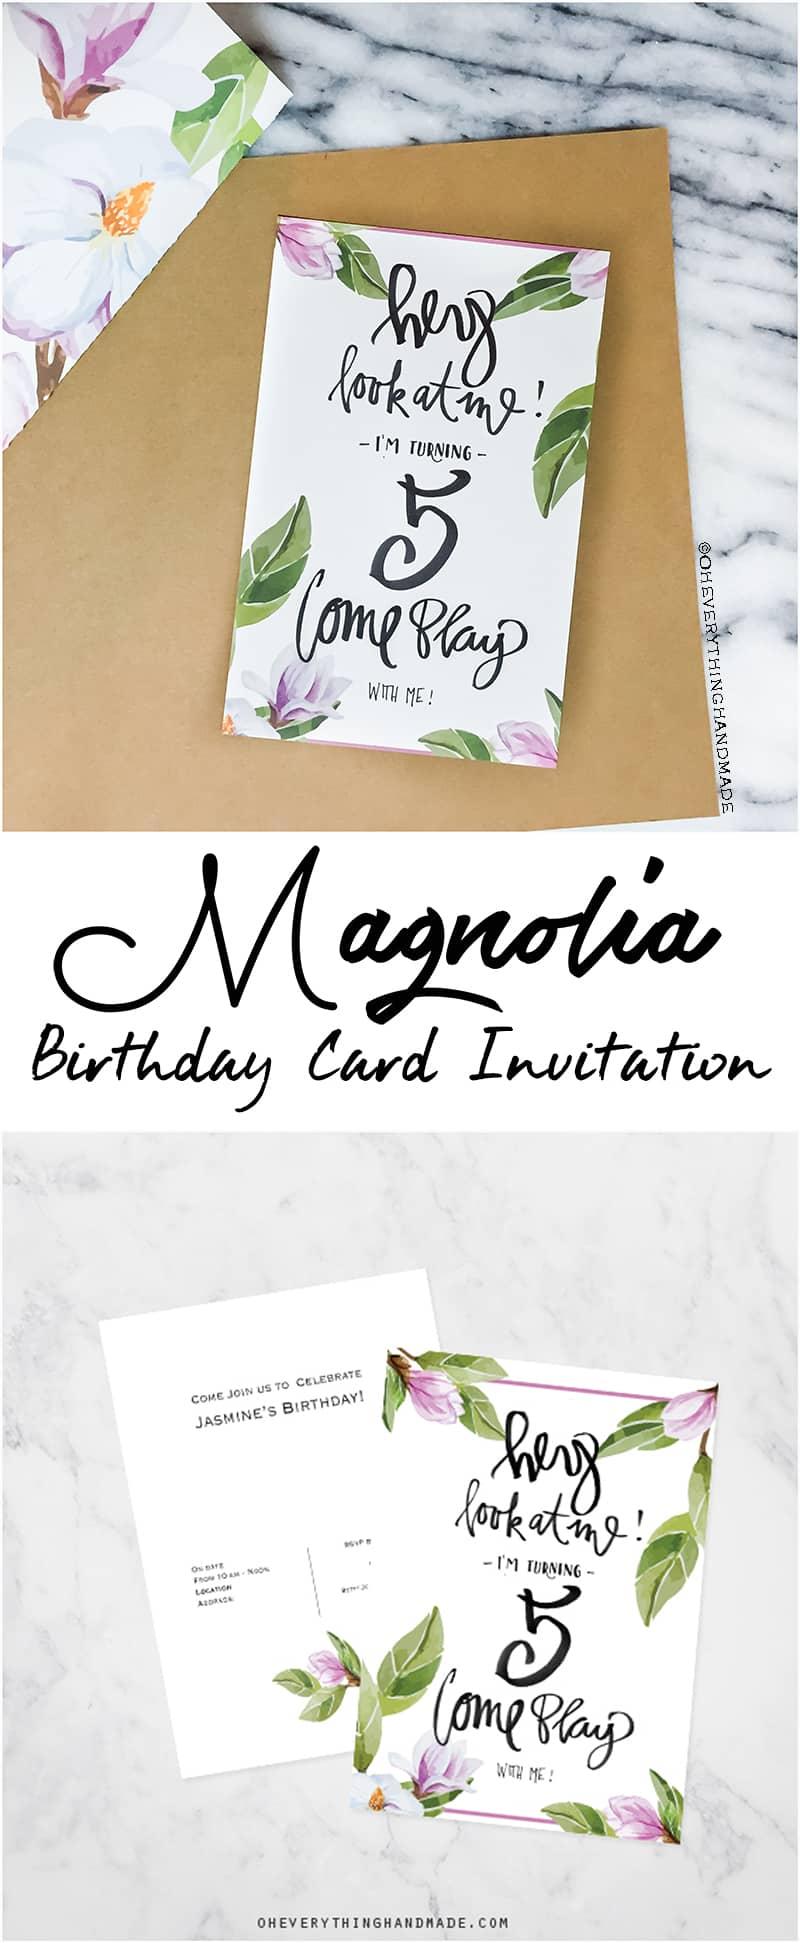 birthday-card-magnolia-pinit800